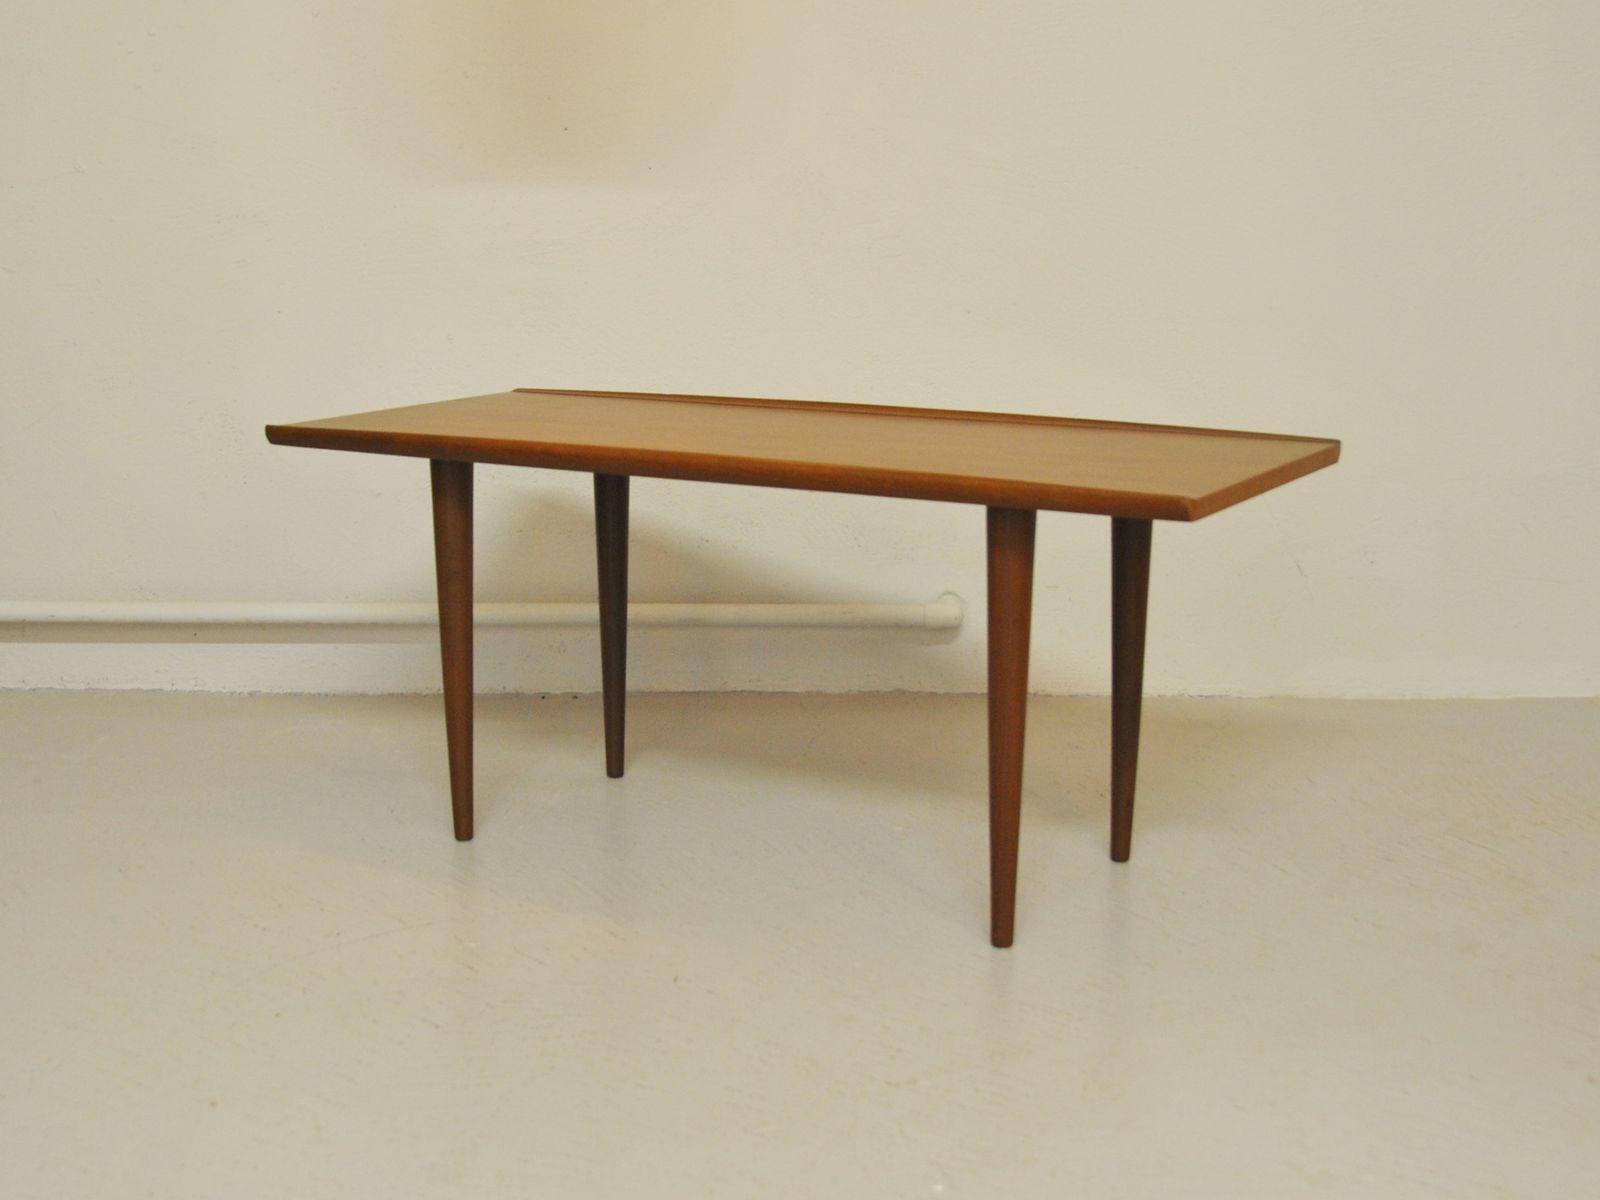 Scandinavian Curved Edge Teak Coffee Table for sale at Pamono